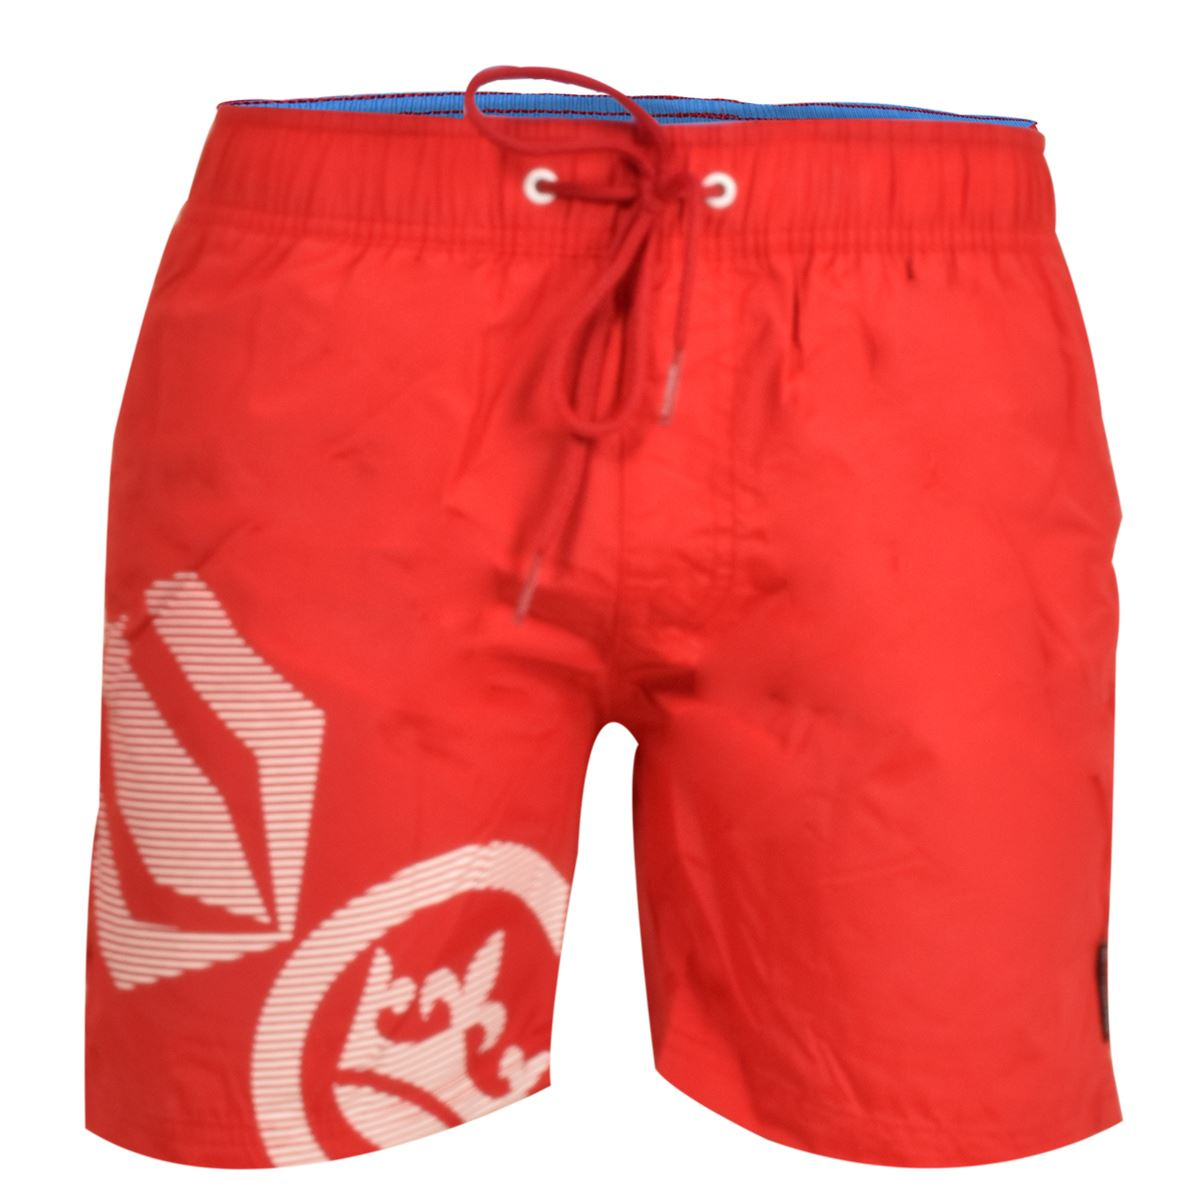 Crosshatch Hawaiin Sun Set Mens Holiday Swim Shorts Summer Beach Trunks S-2XL